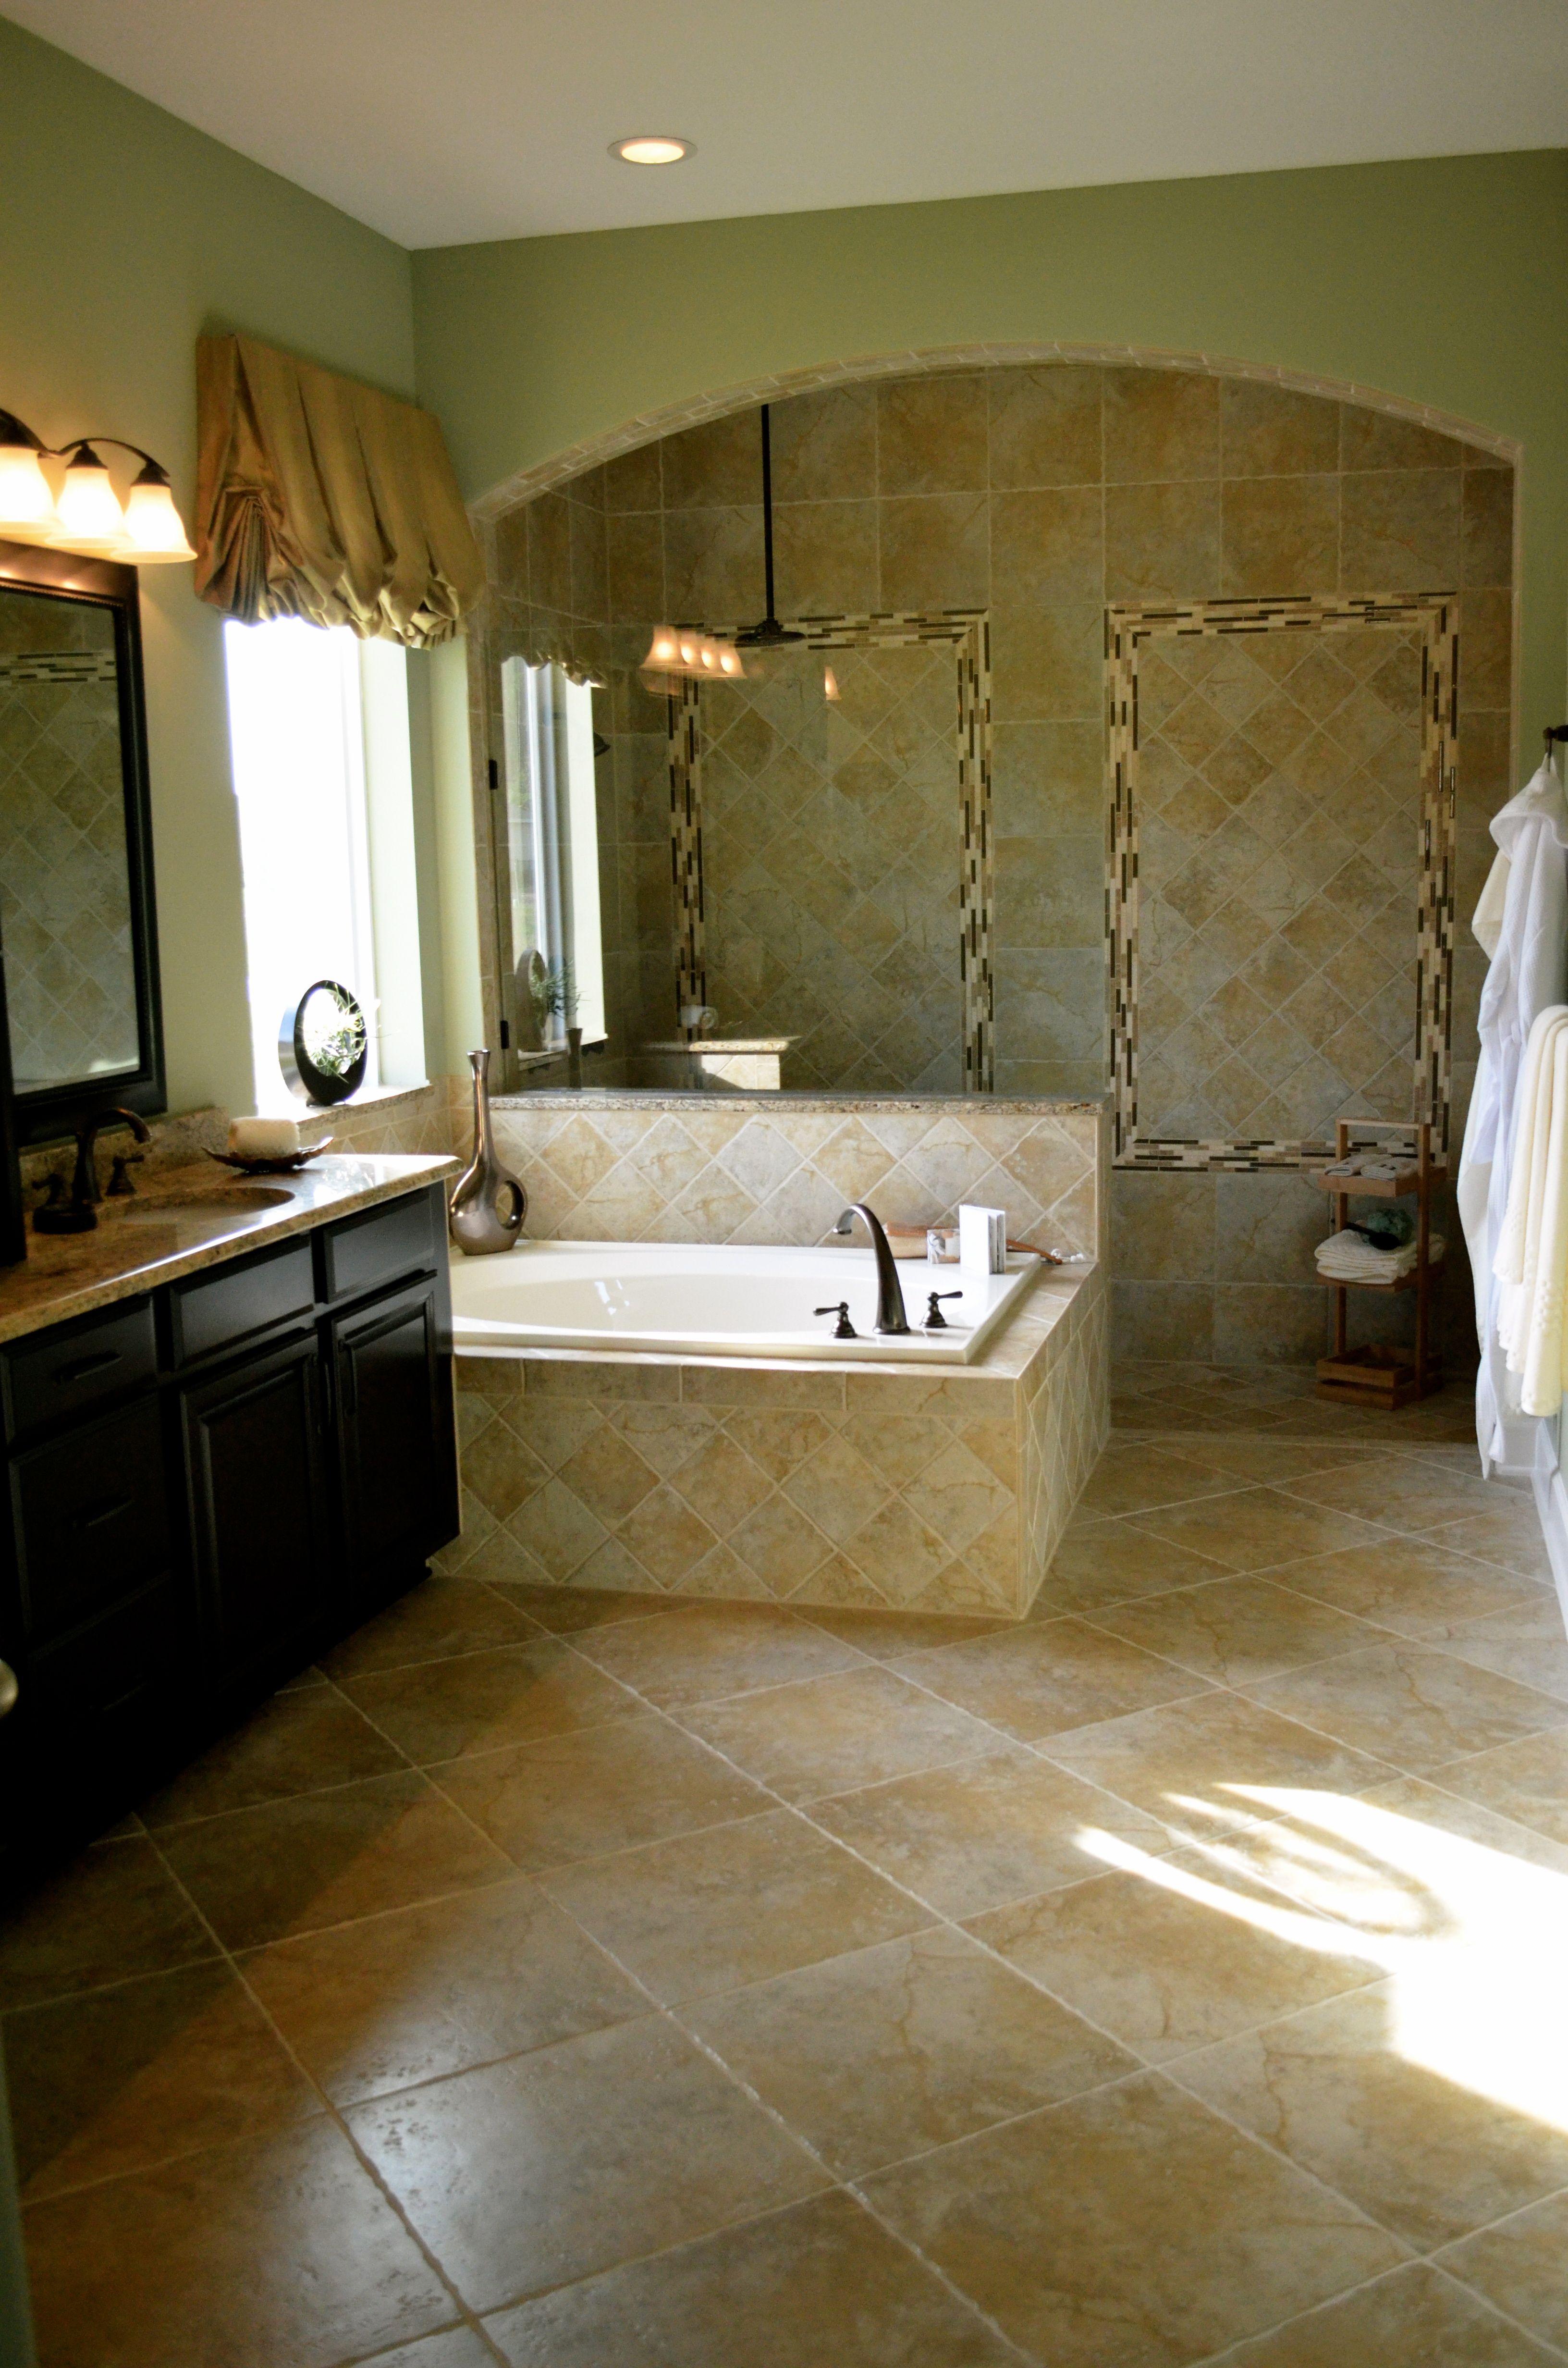 Beautiful Master Bath  Walk in Shower with tile galore  David Weekley Homes  ModelBeautiful Master Bath  Walk in Shower with tile galore  David  . Master Bath Walk In Shower. Home Design Ideas